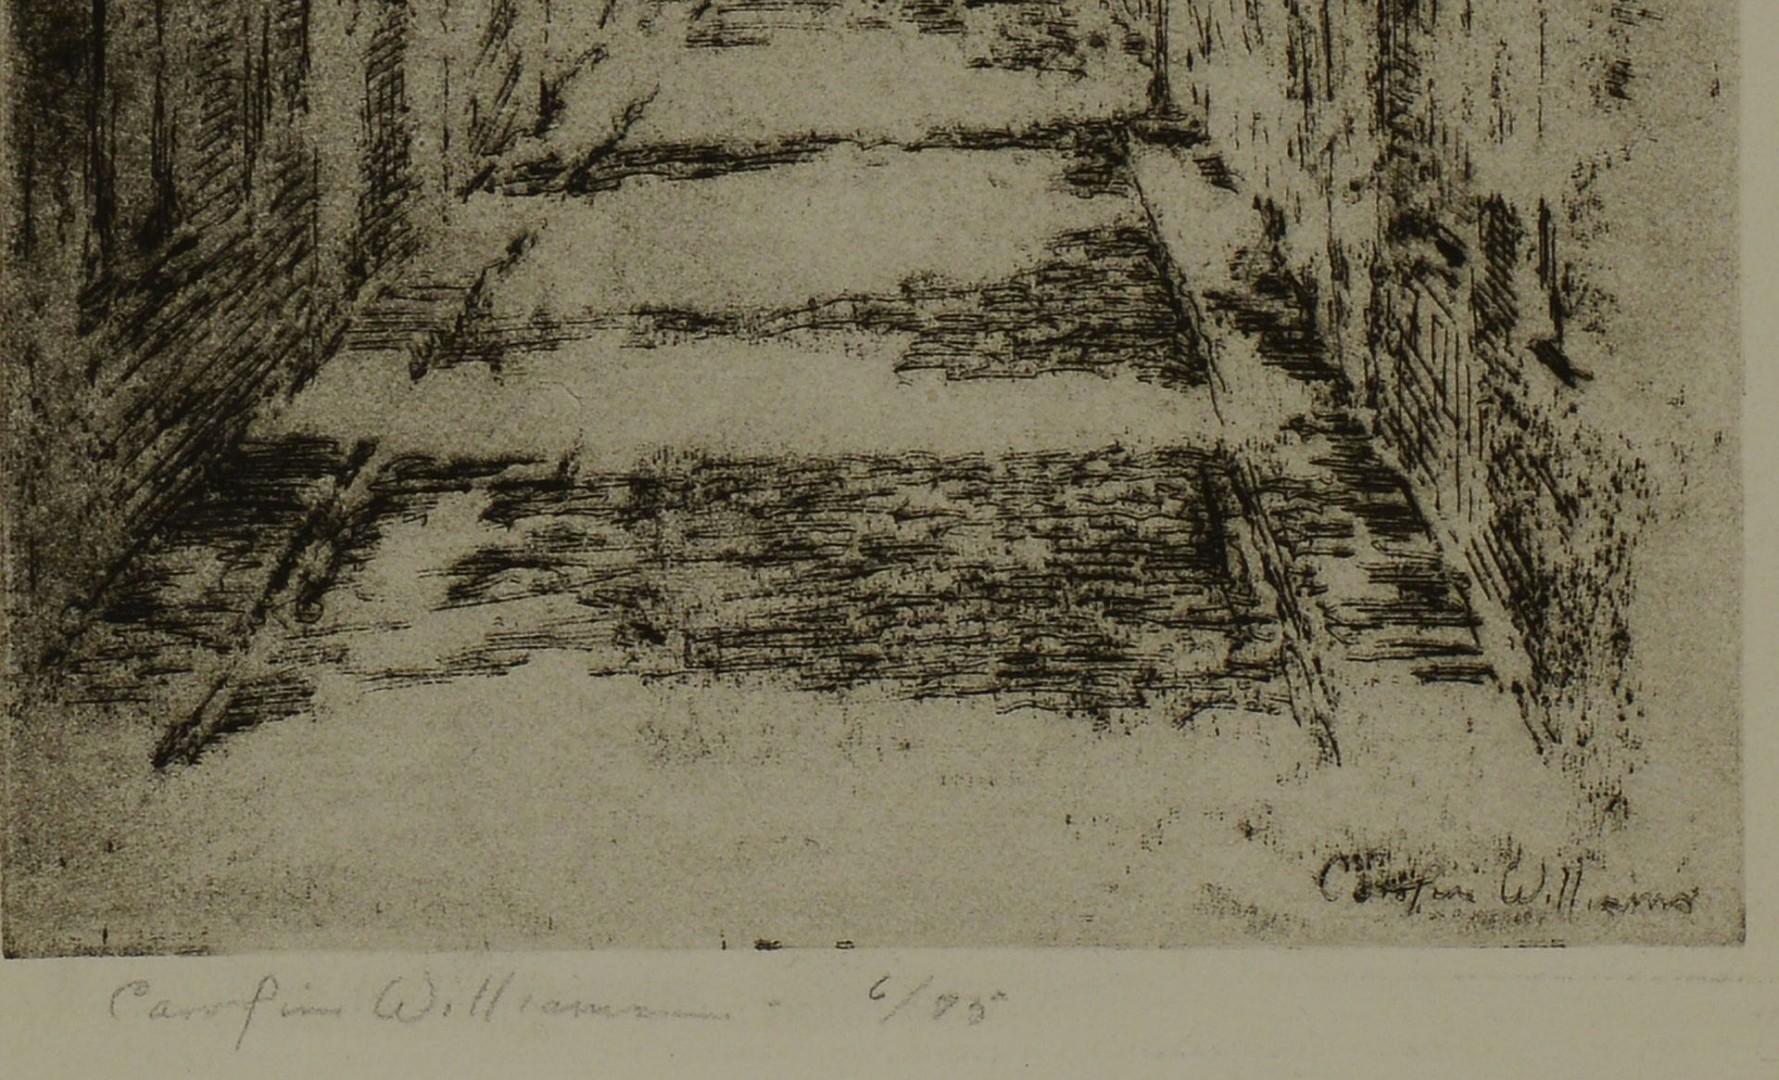 2 Cincinnati Etchings by E. Hurley & Williamson